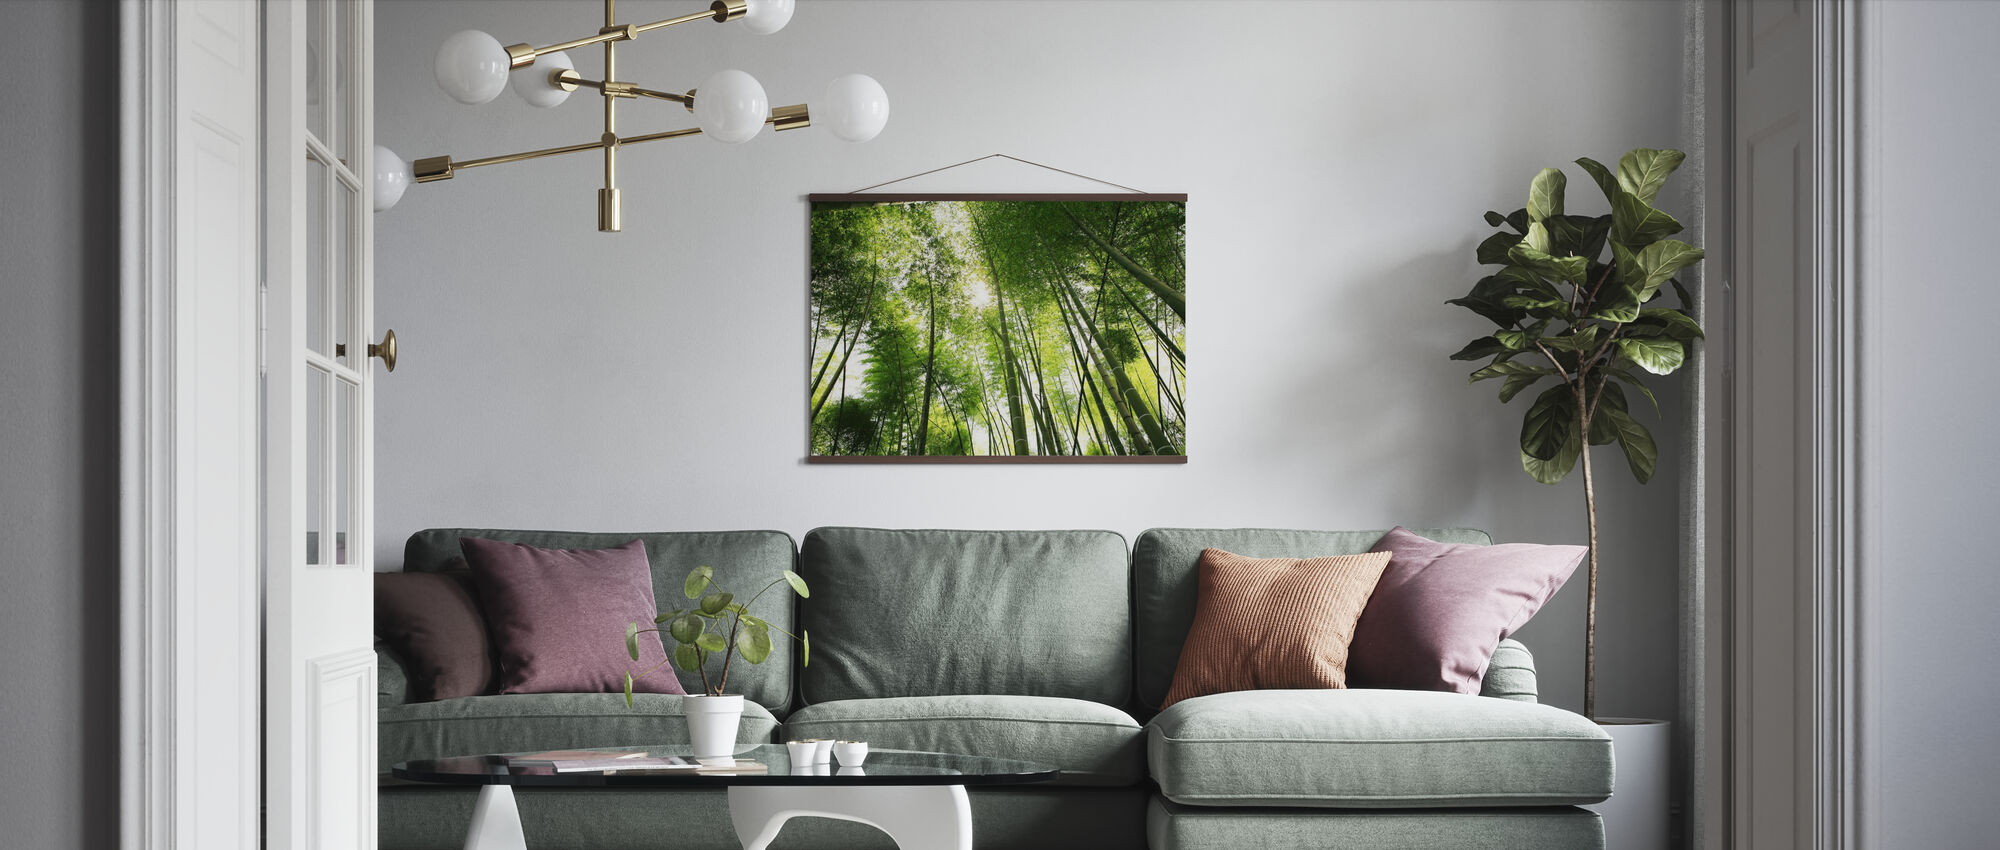 Mektige bambus - Plakat - Stue